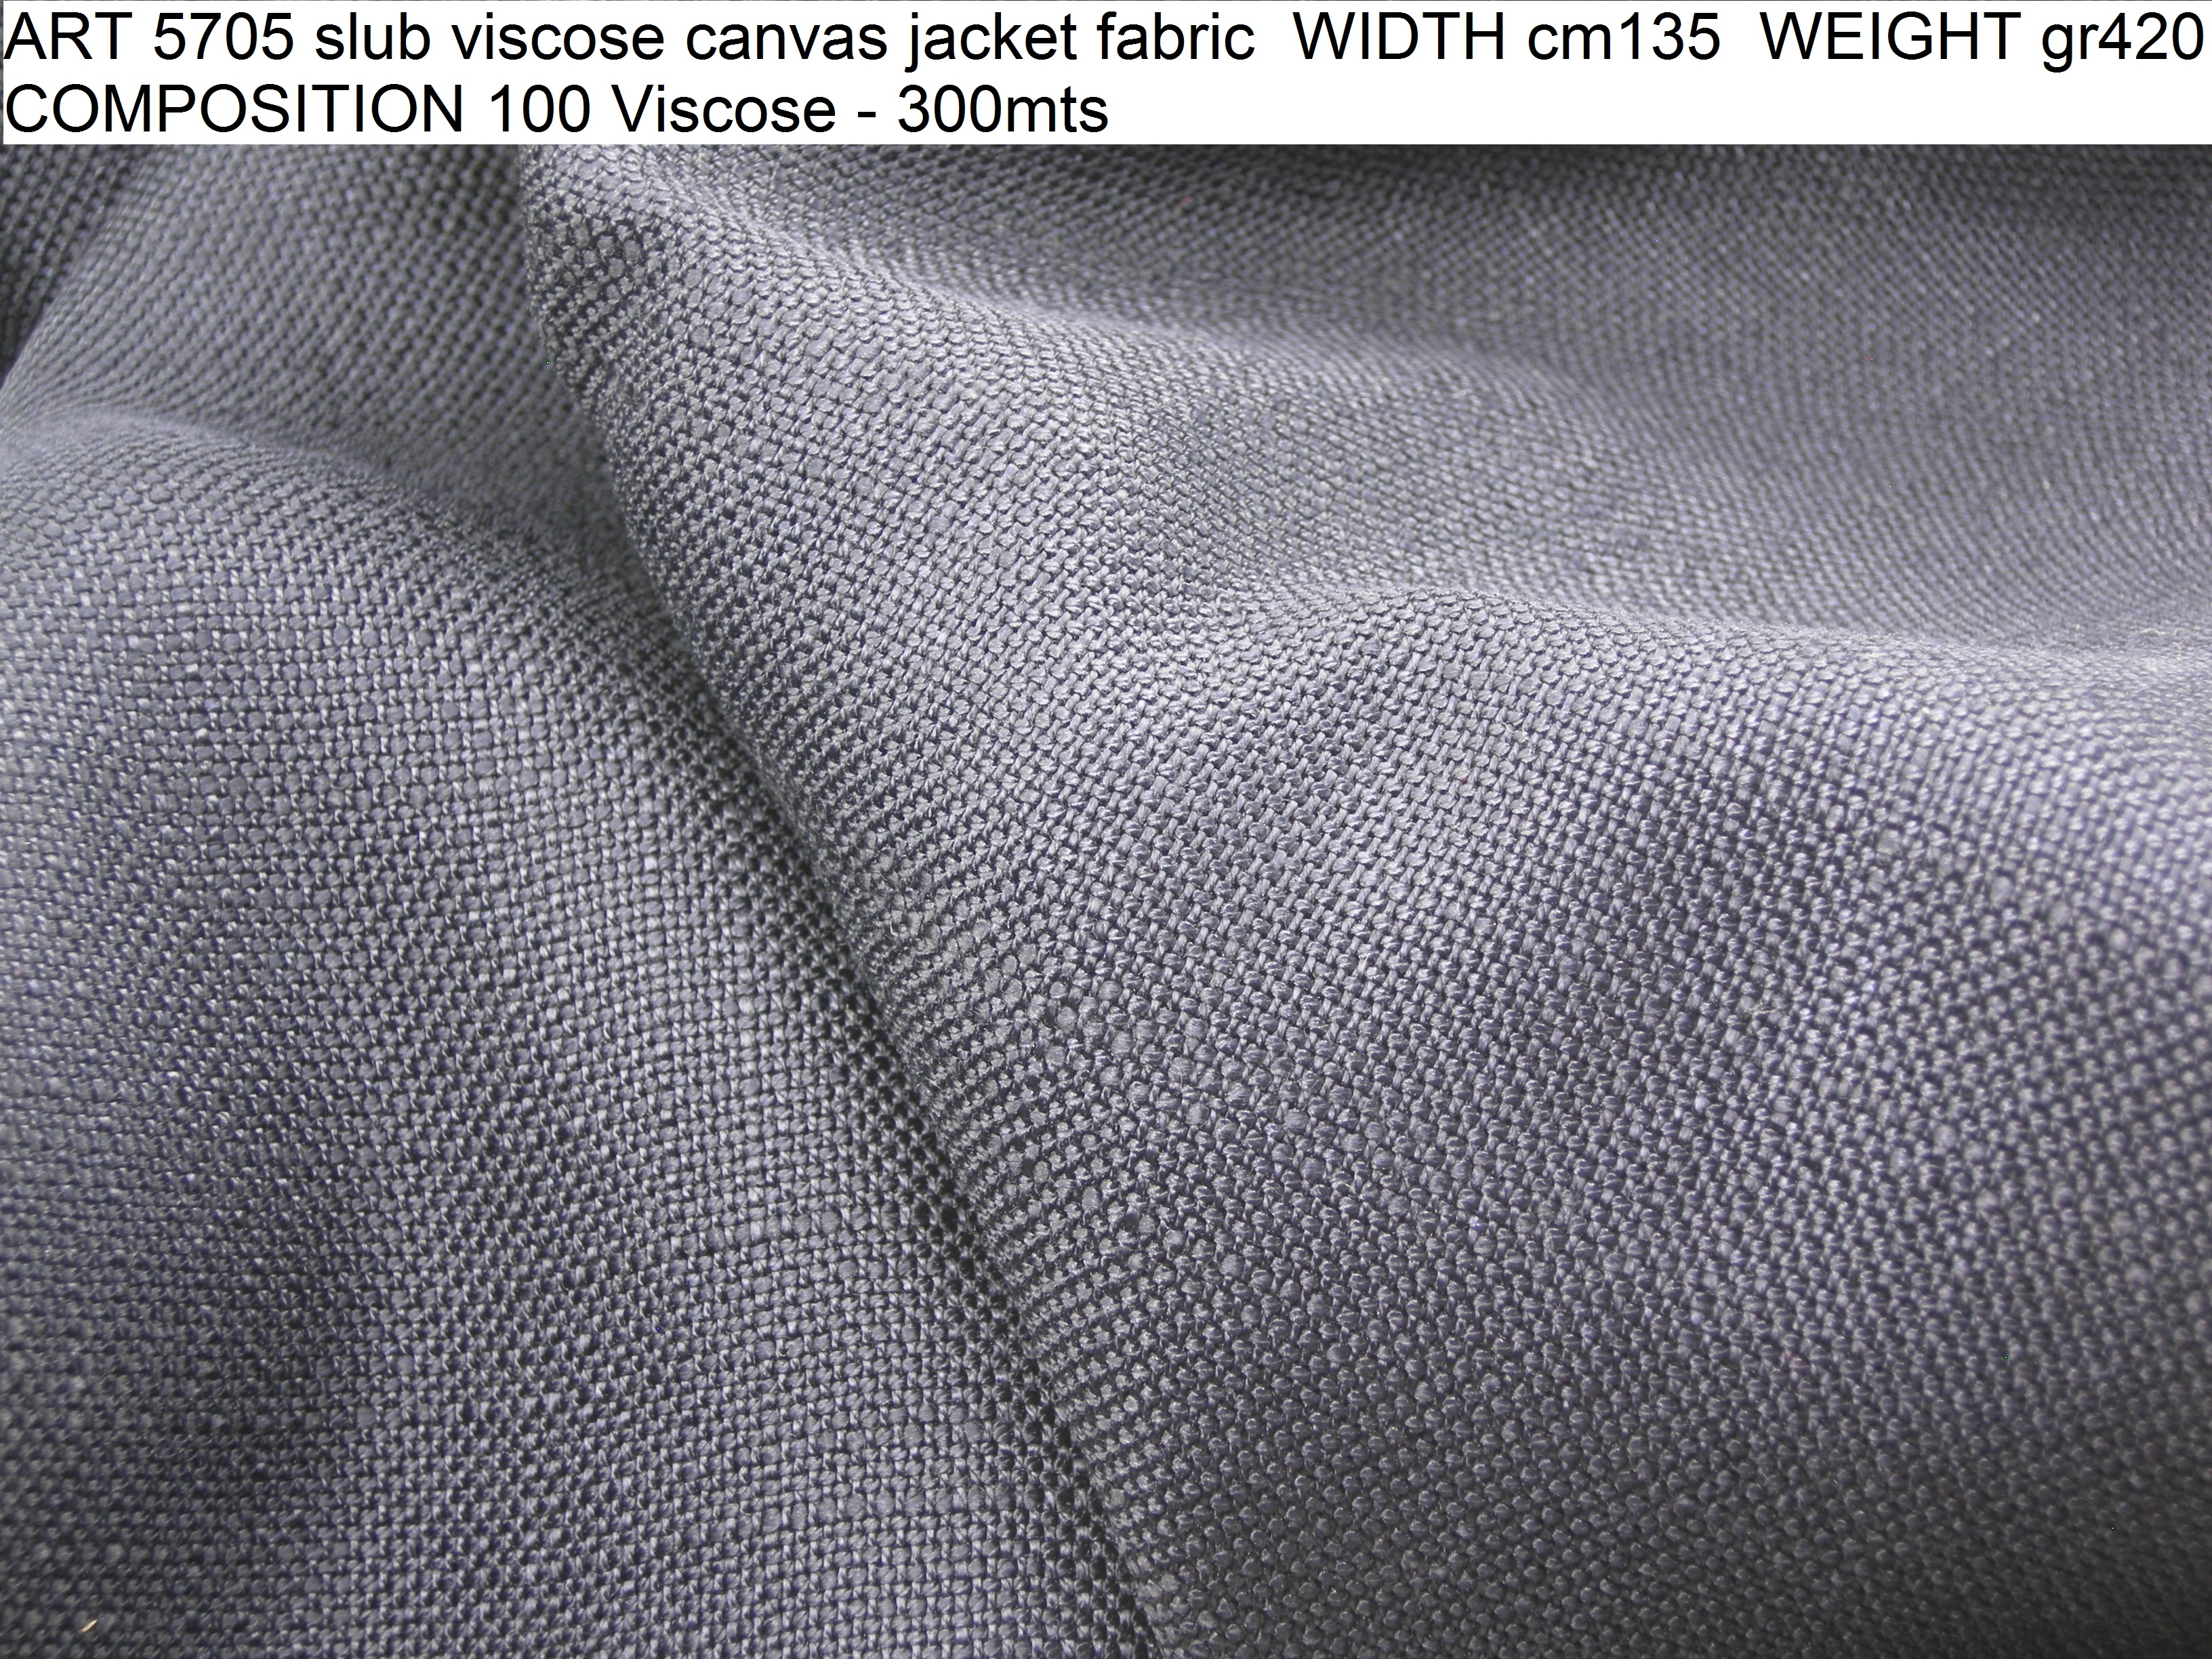 ART 5705 slub viscose canvas jacket fabric WIDTH cm135 WEIGHT gr420 COMPOSITION 100 Viscose - 300mts